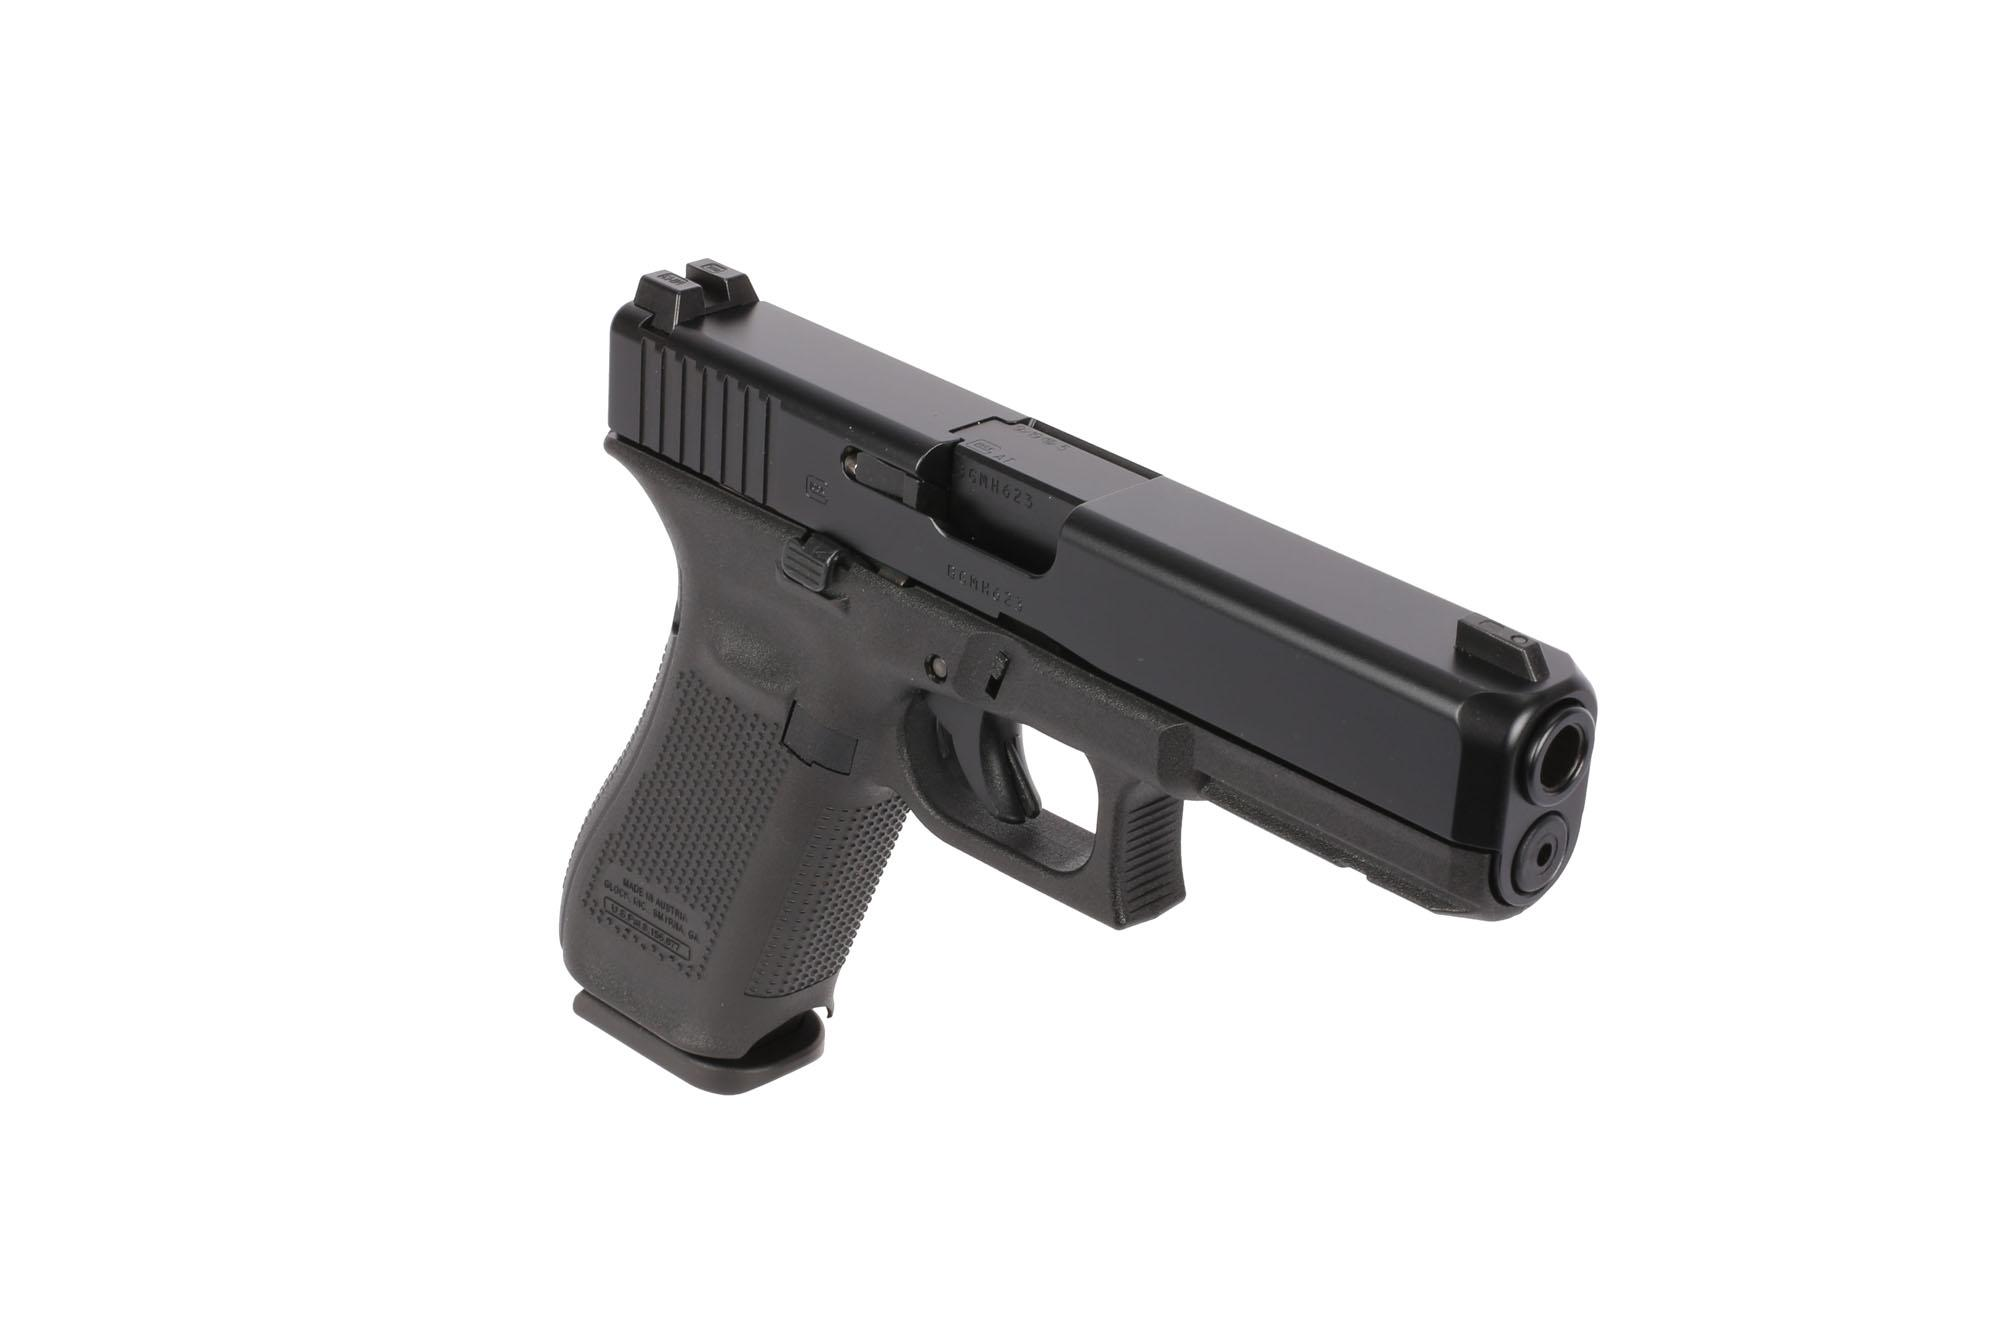 glock g17 gen5 9mm full size pistol 17 round night sights